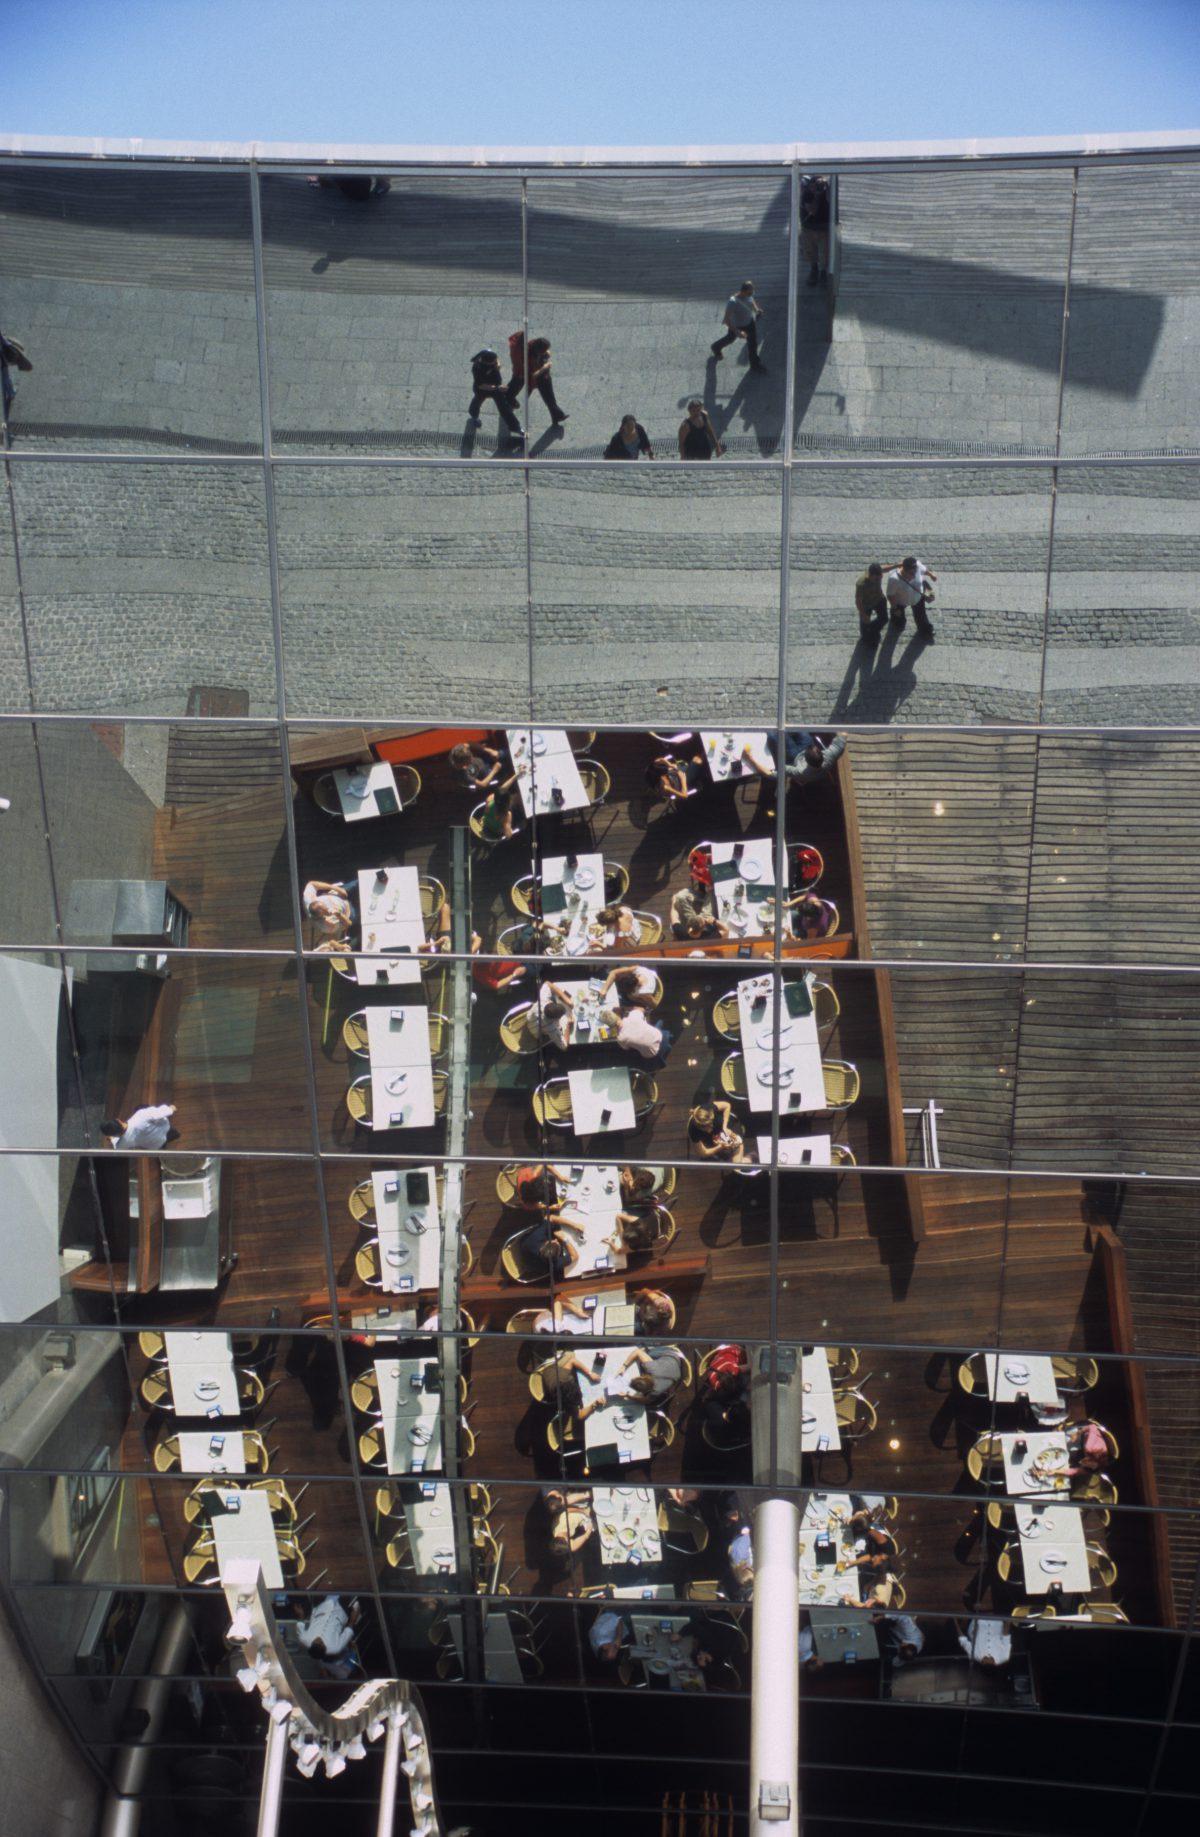 restaurant, reflection